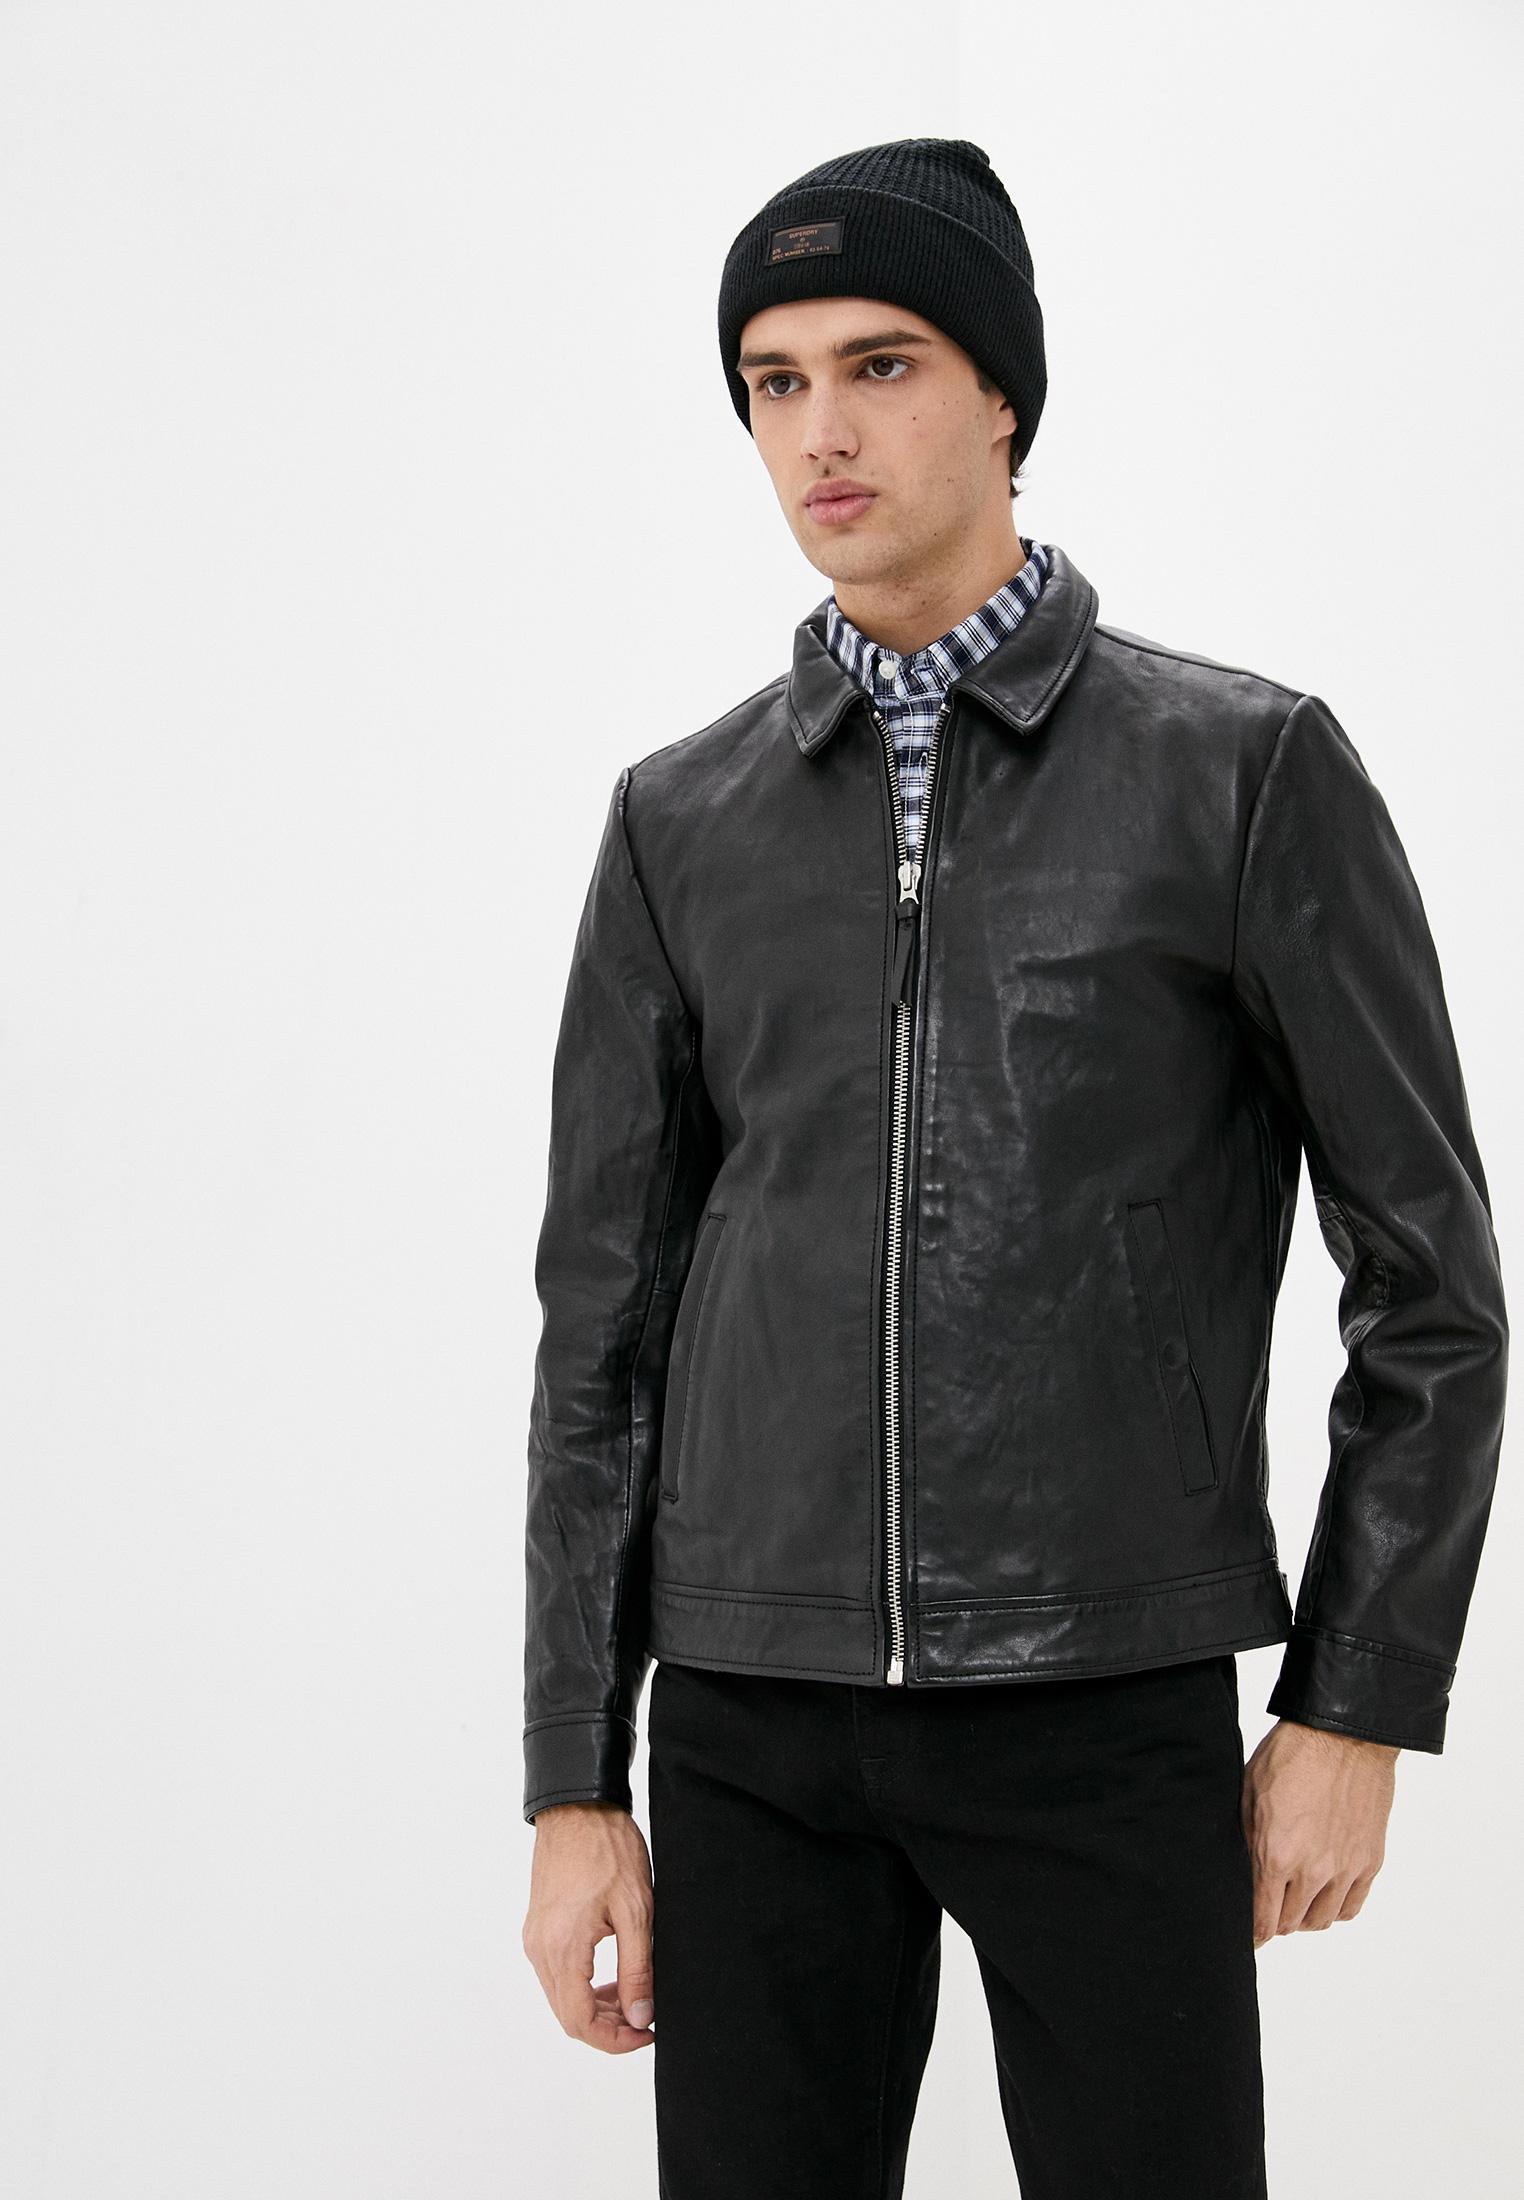 Кожаная куртка Superdry Куртка кожаная Superdry